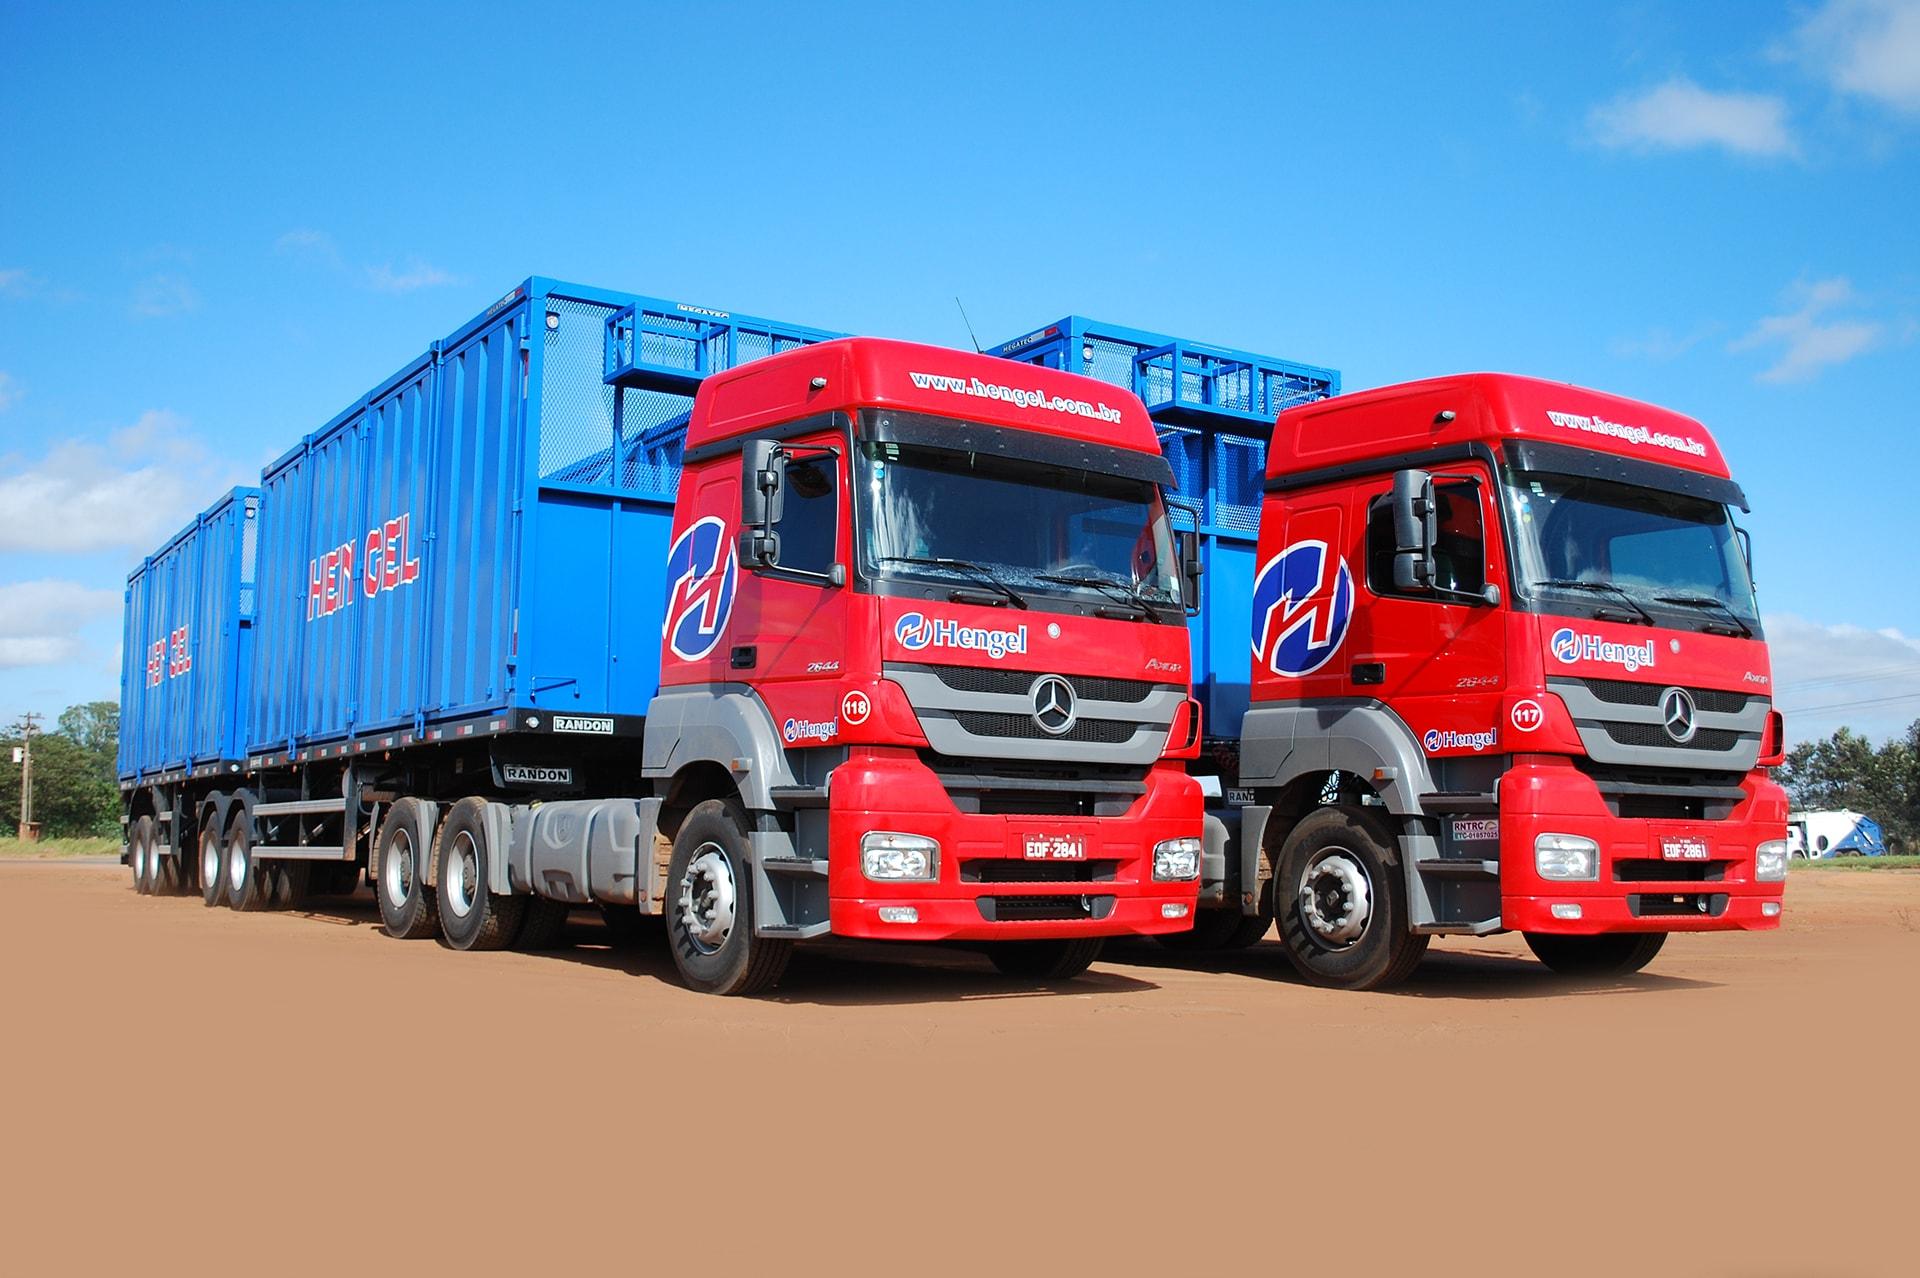 Hengel Transportes - Logística de Biomassa